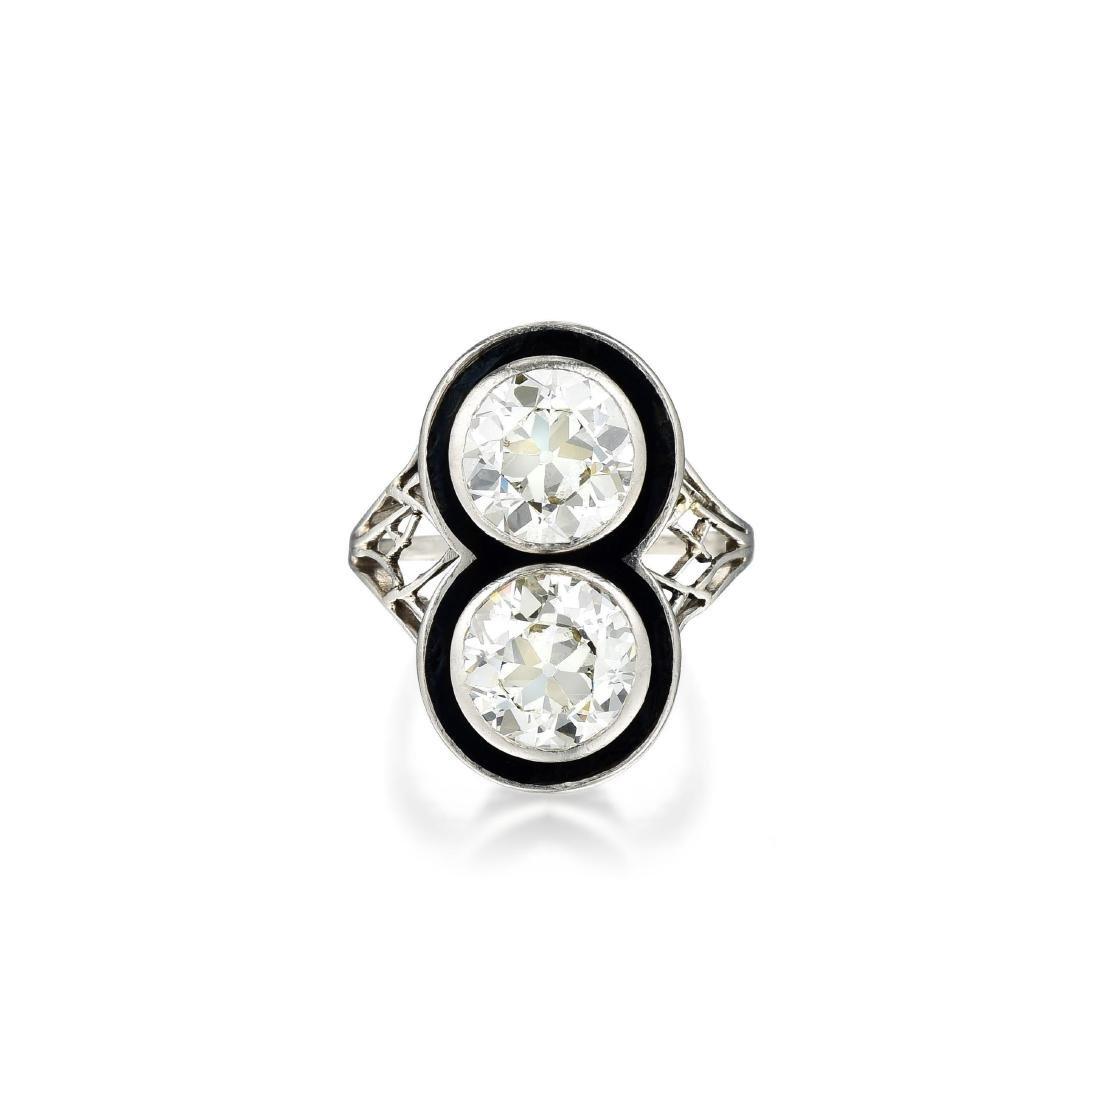 Antique Diamond and Enamel Ring